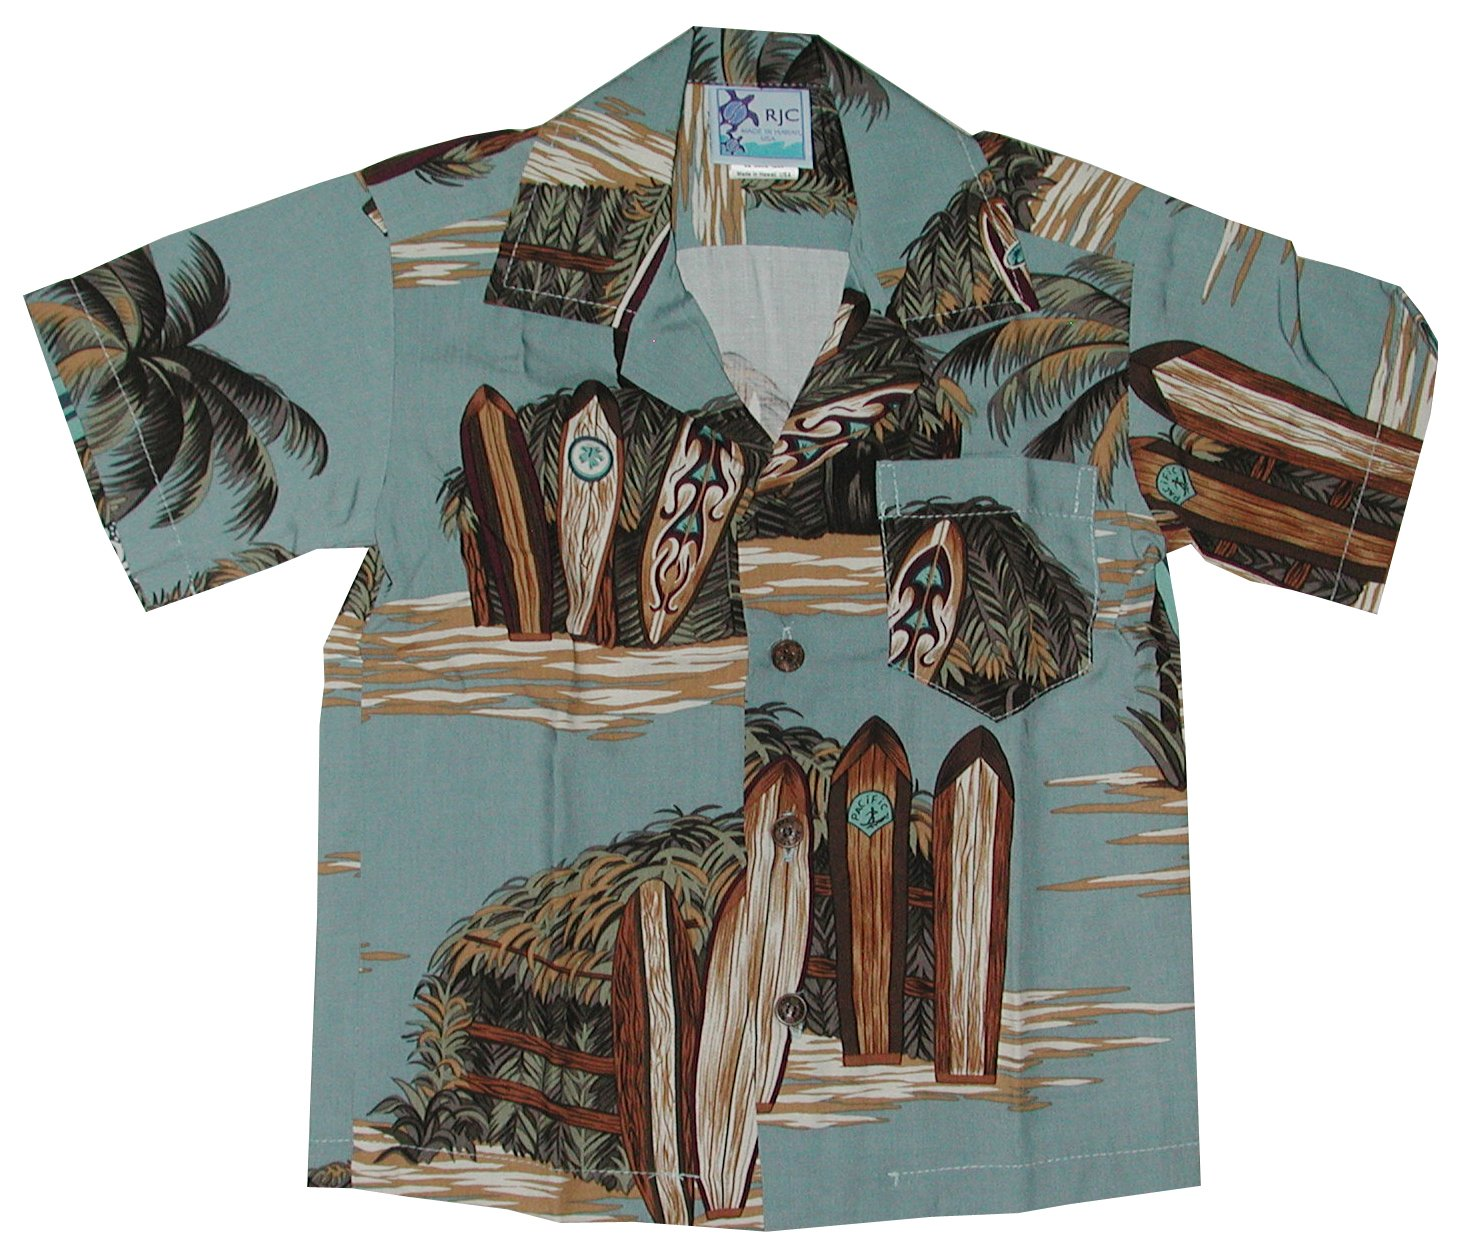 RJC Boys Surfboard Beach Shack Rayon Shirt Denim 6 by RJC (Image #1)